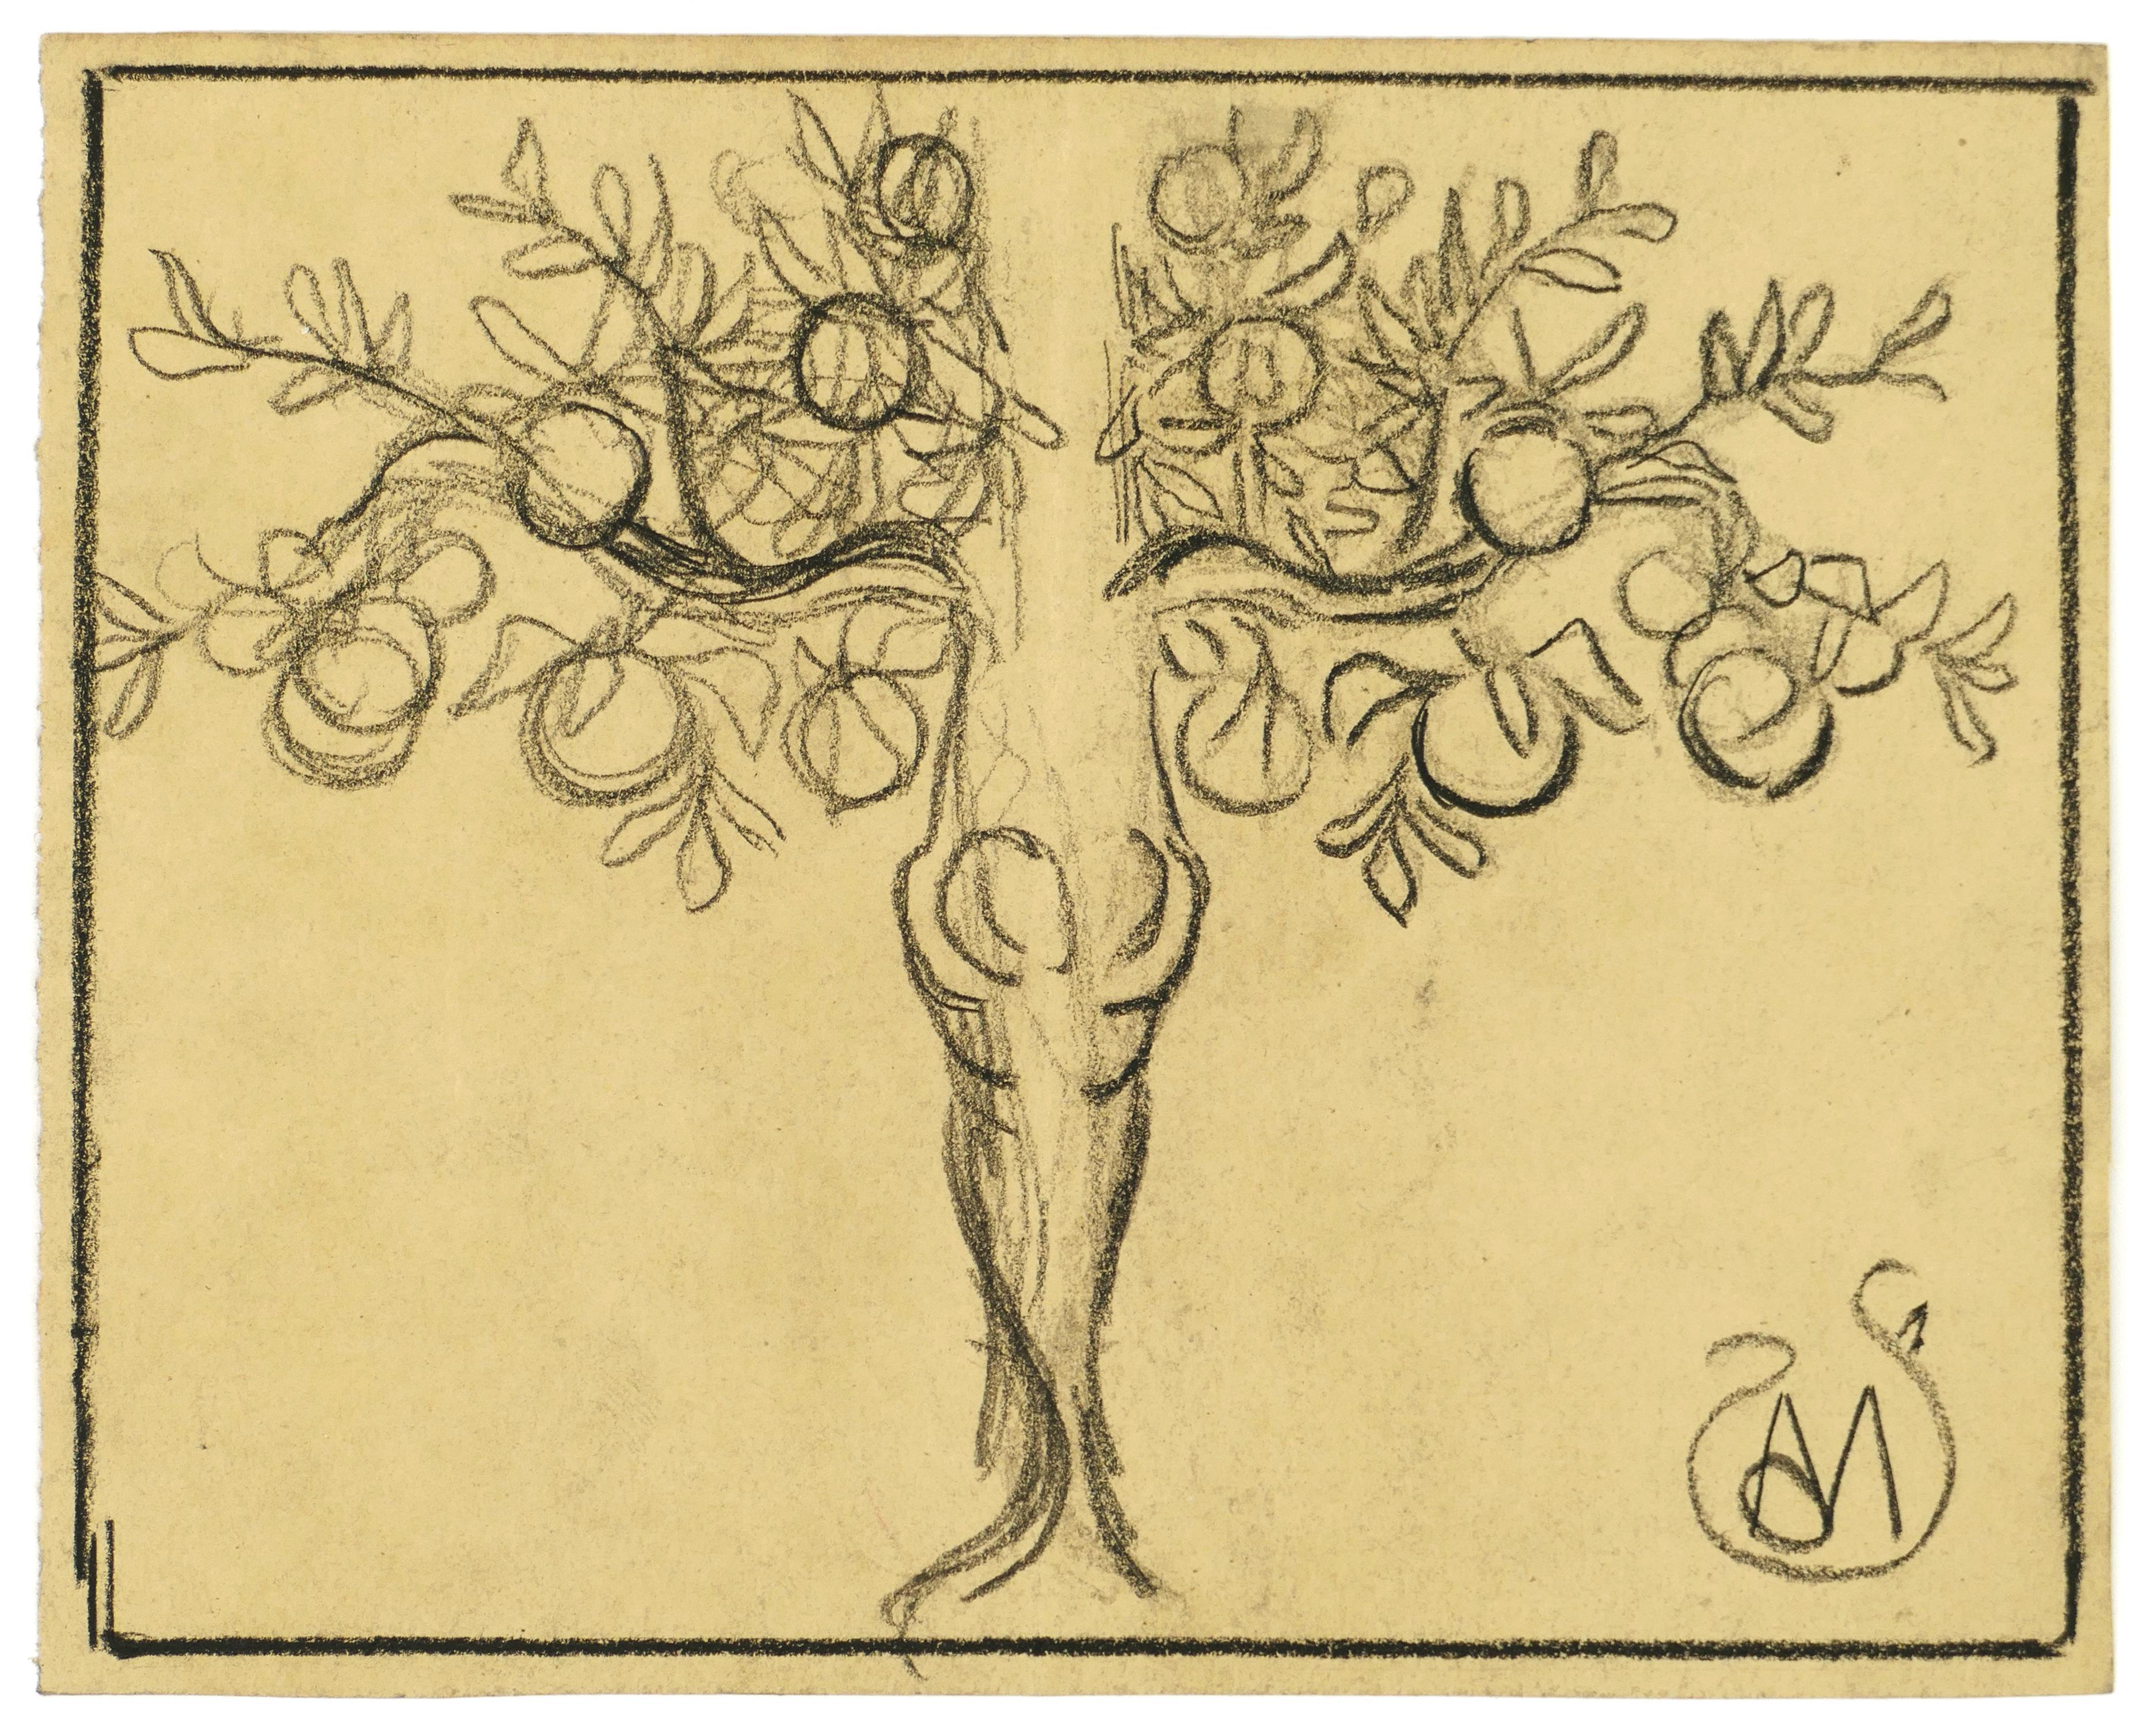 Fruit Tree - Charcoal on Paper by A. Mérodack-Jeanneau